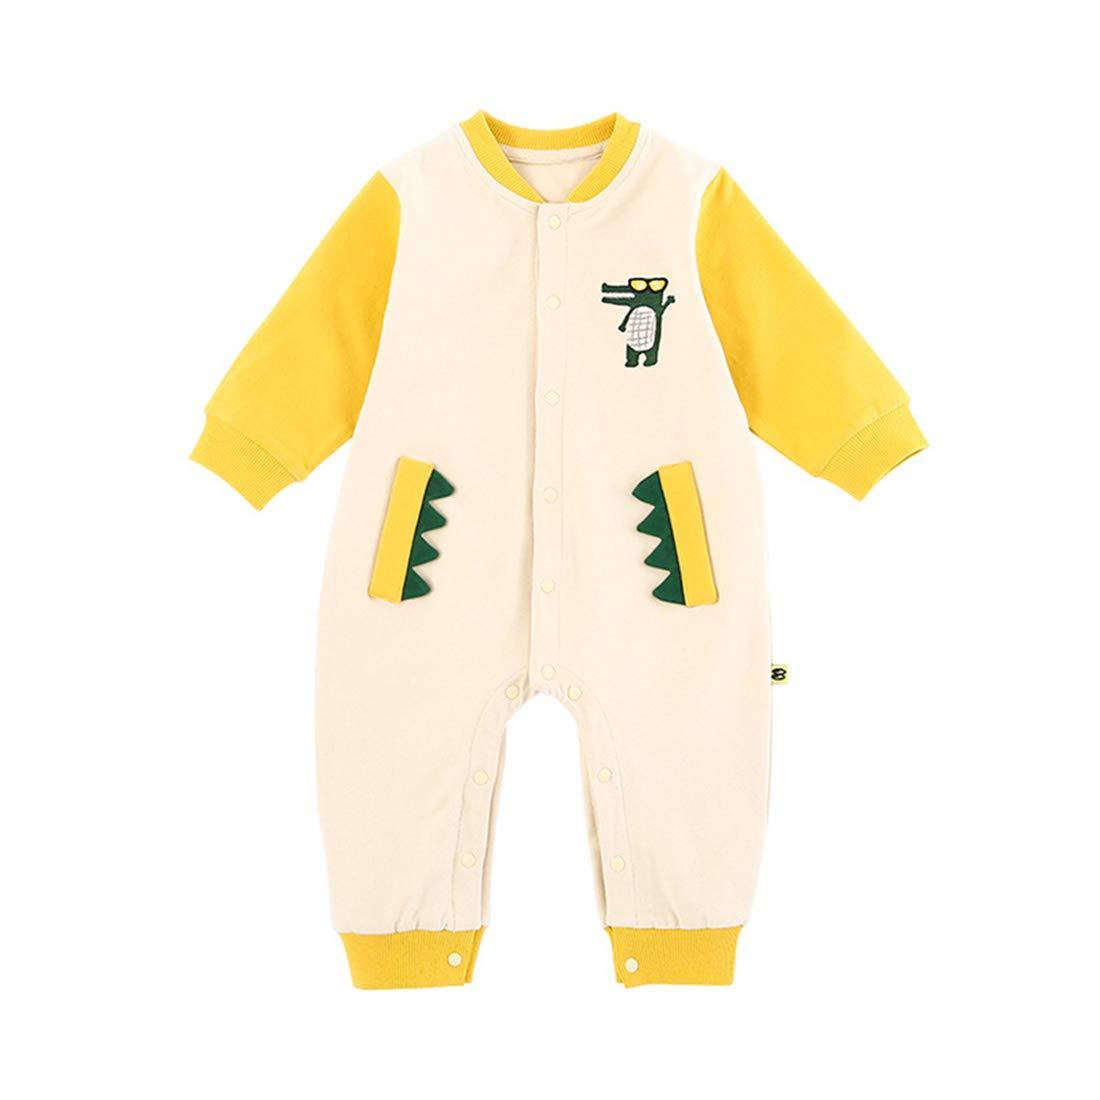 XINXINHAIHE Unisex Baby Long Sleeve Romper Contrast Color Crocodile Design Cotton Jumpsuit